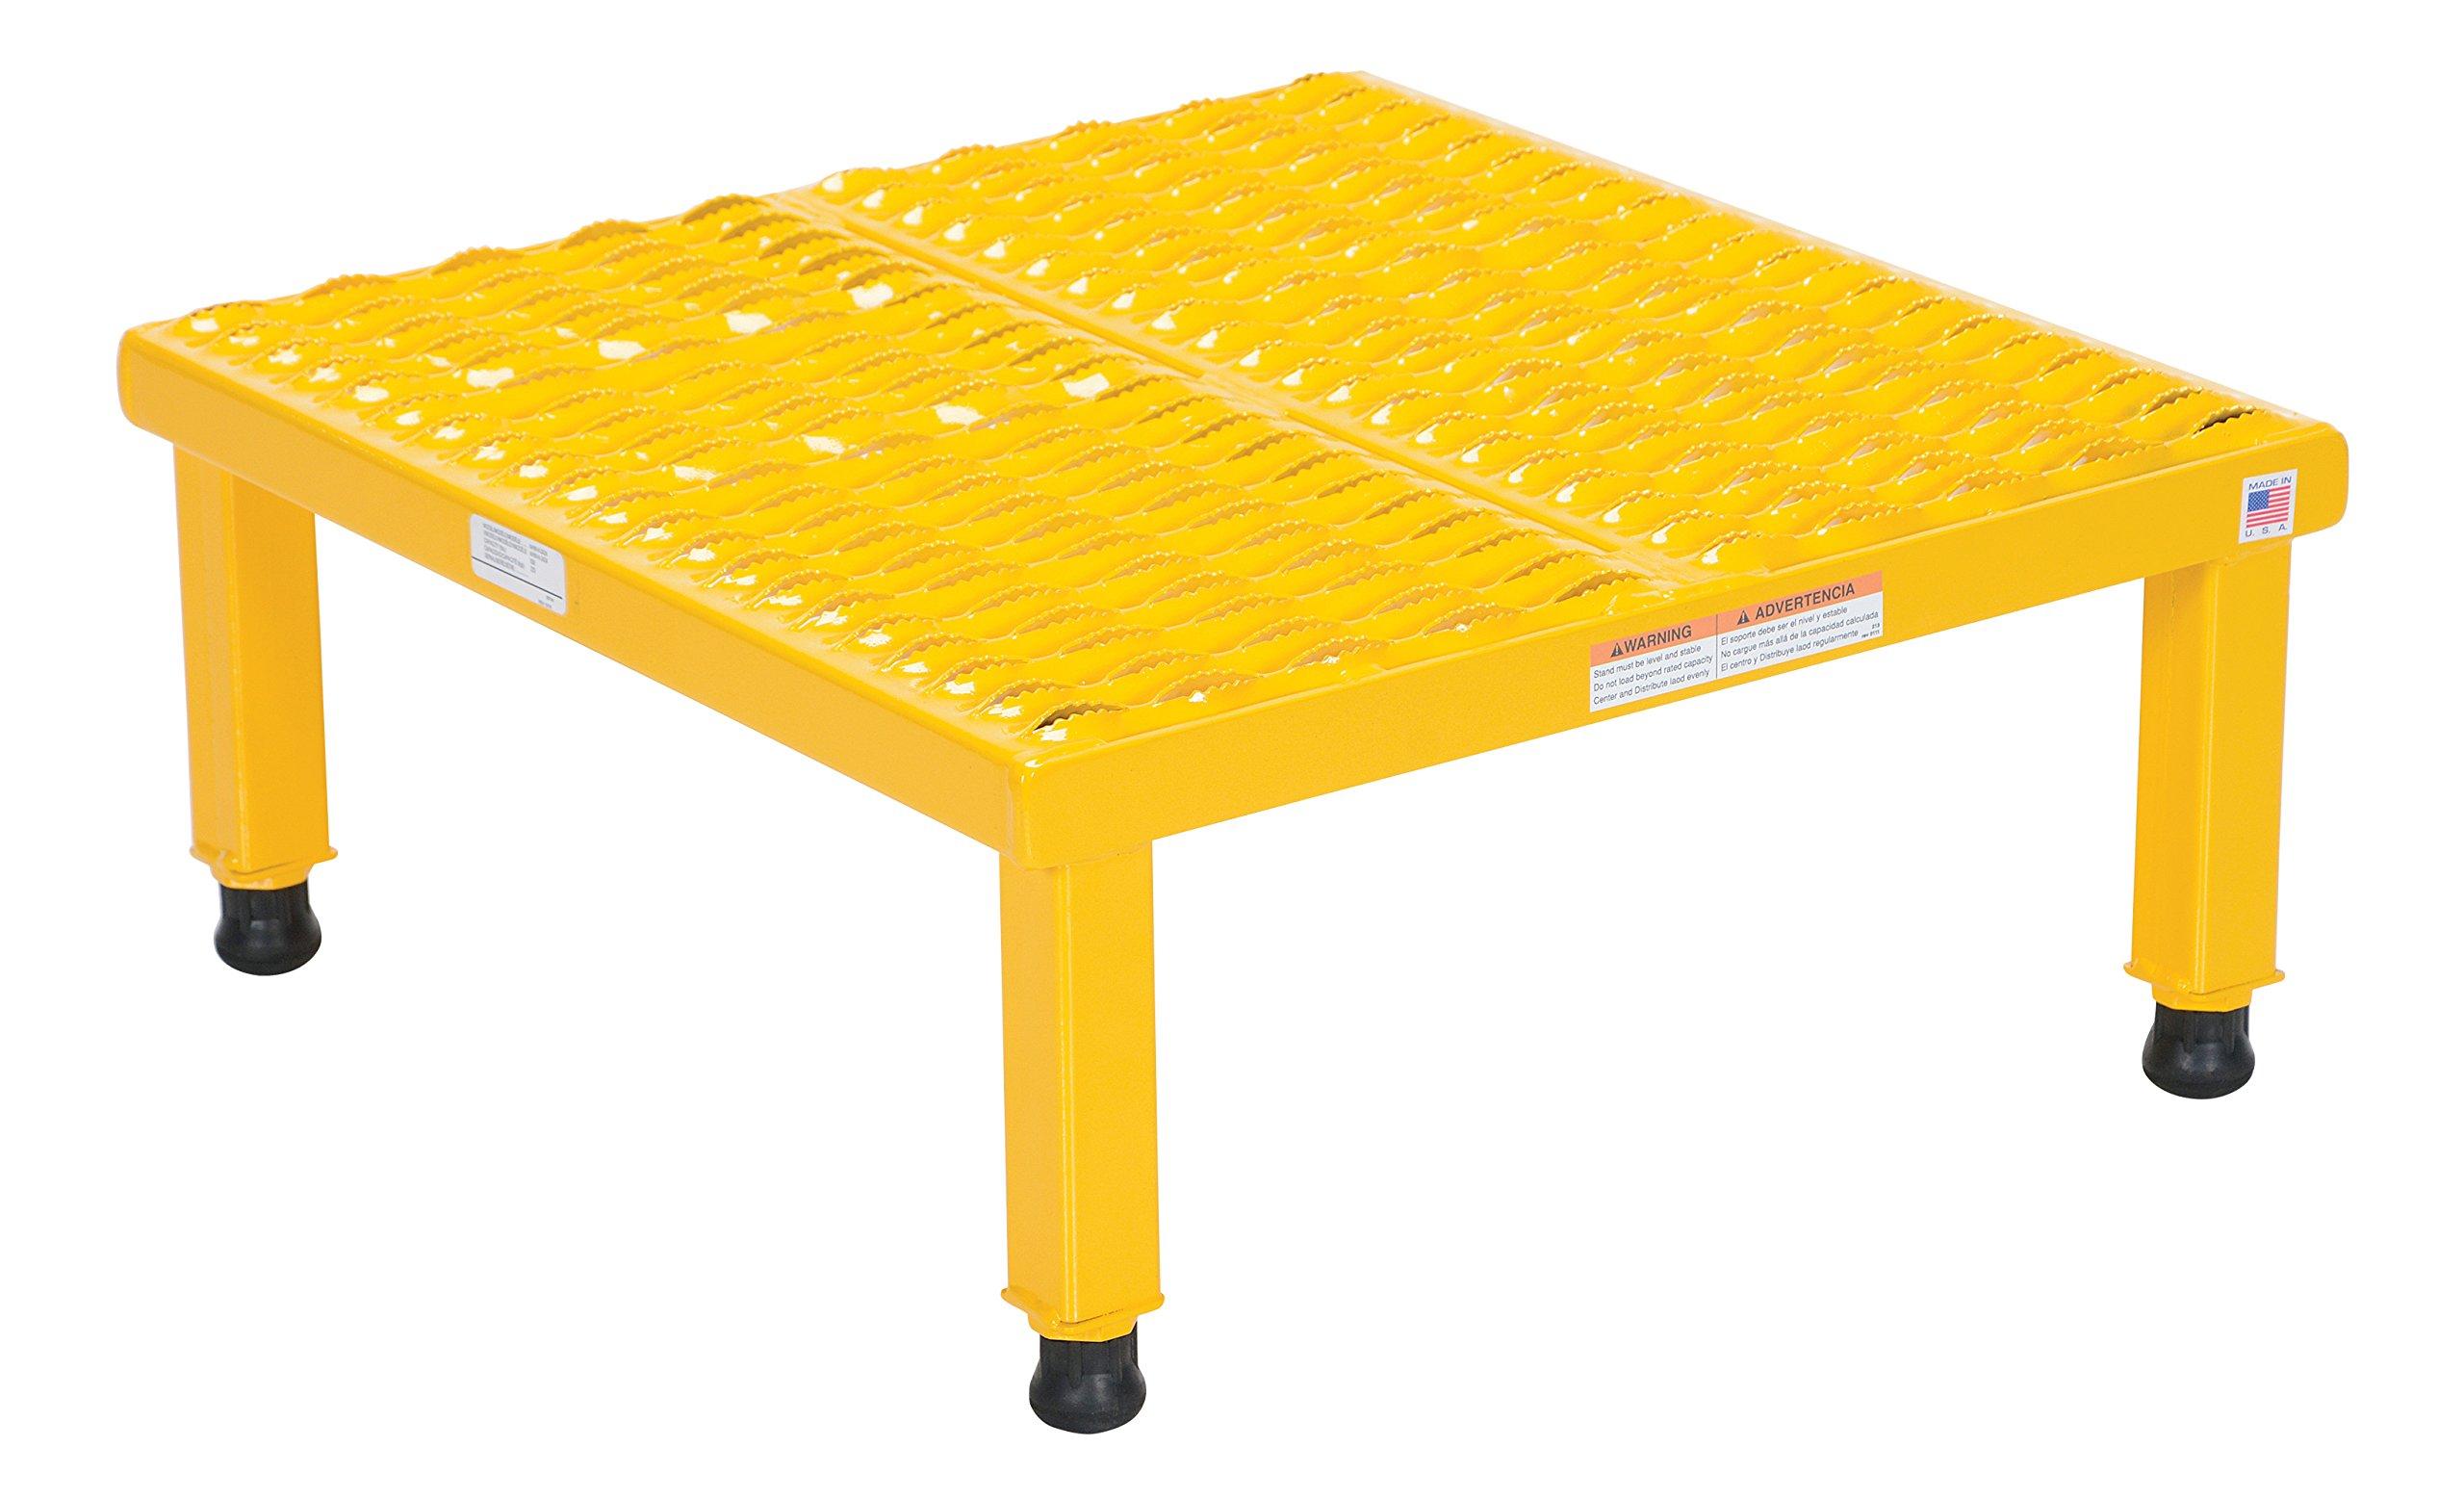 Vestil AHW-H-2424 Adjustable Work-Mate Stand with Serrated Deck, Steel, 24'' Length x 24'' Width Deck, 500 lbs Capacity, 9'' - 14'' Height Range